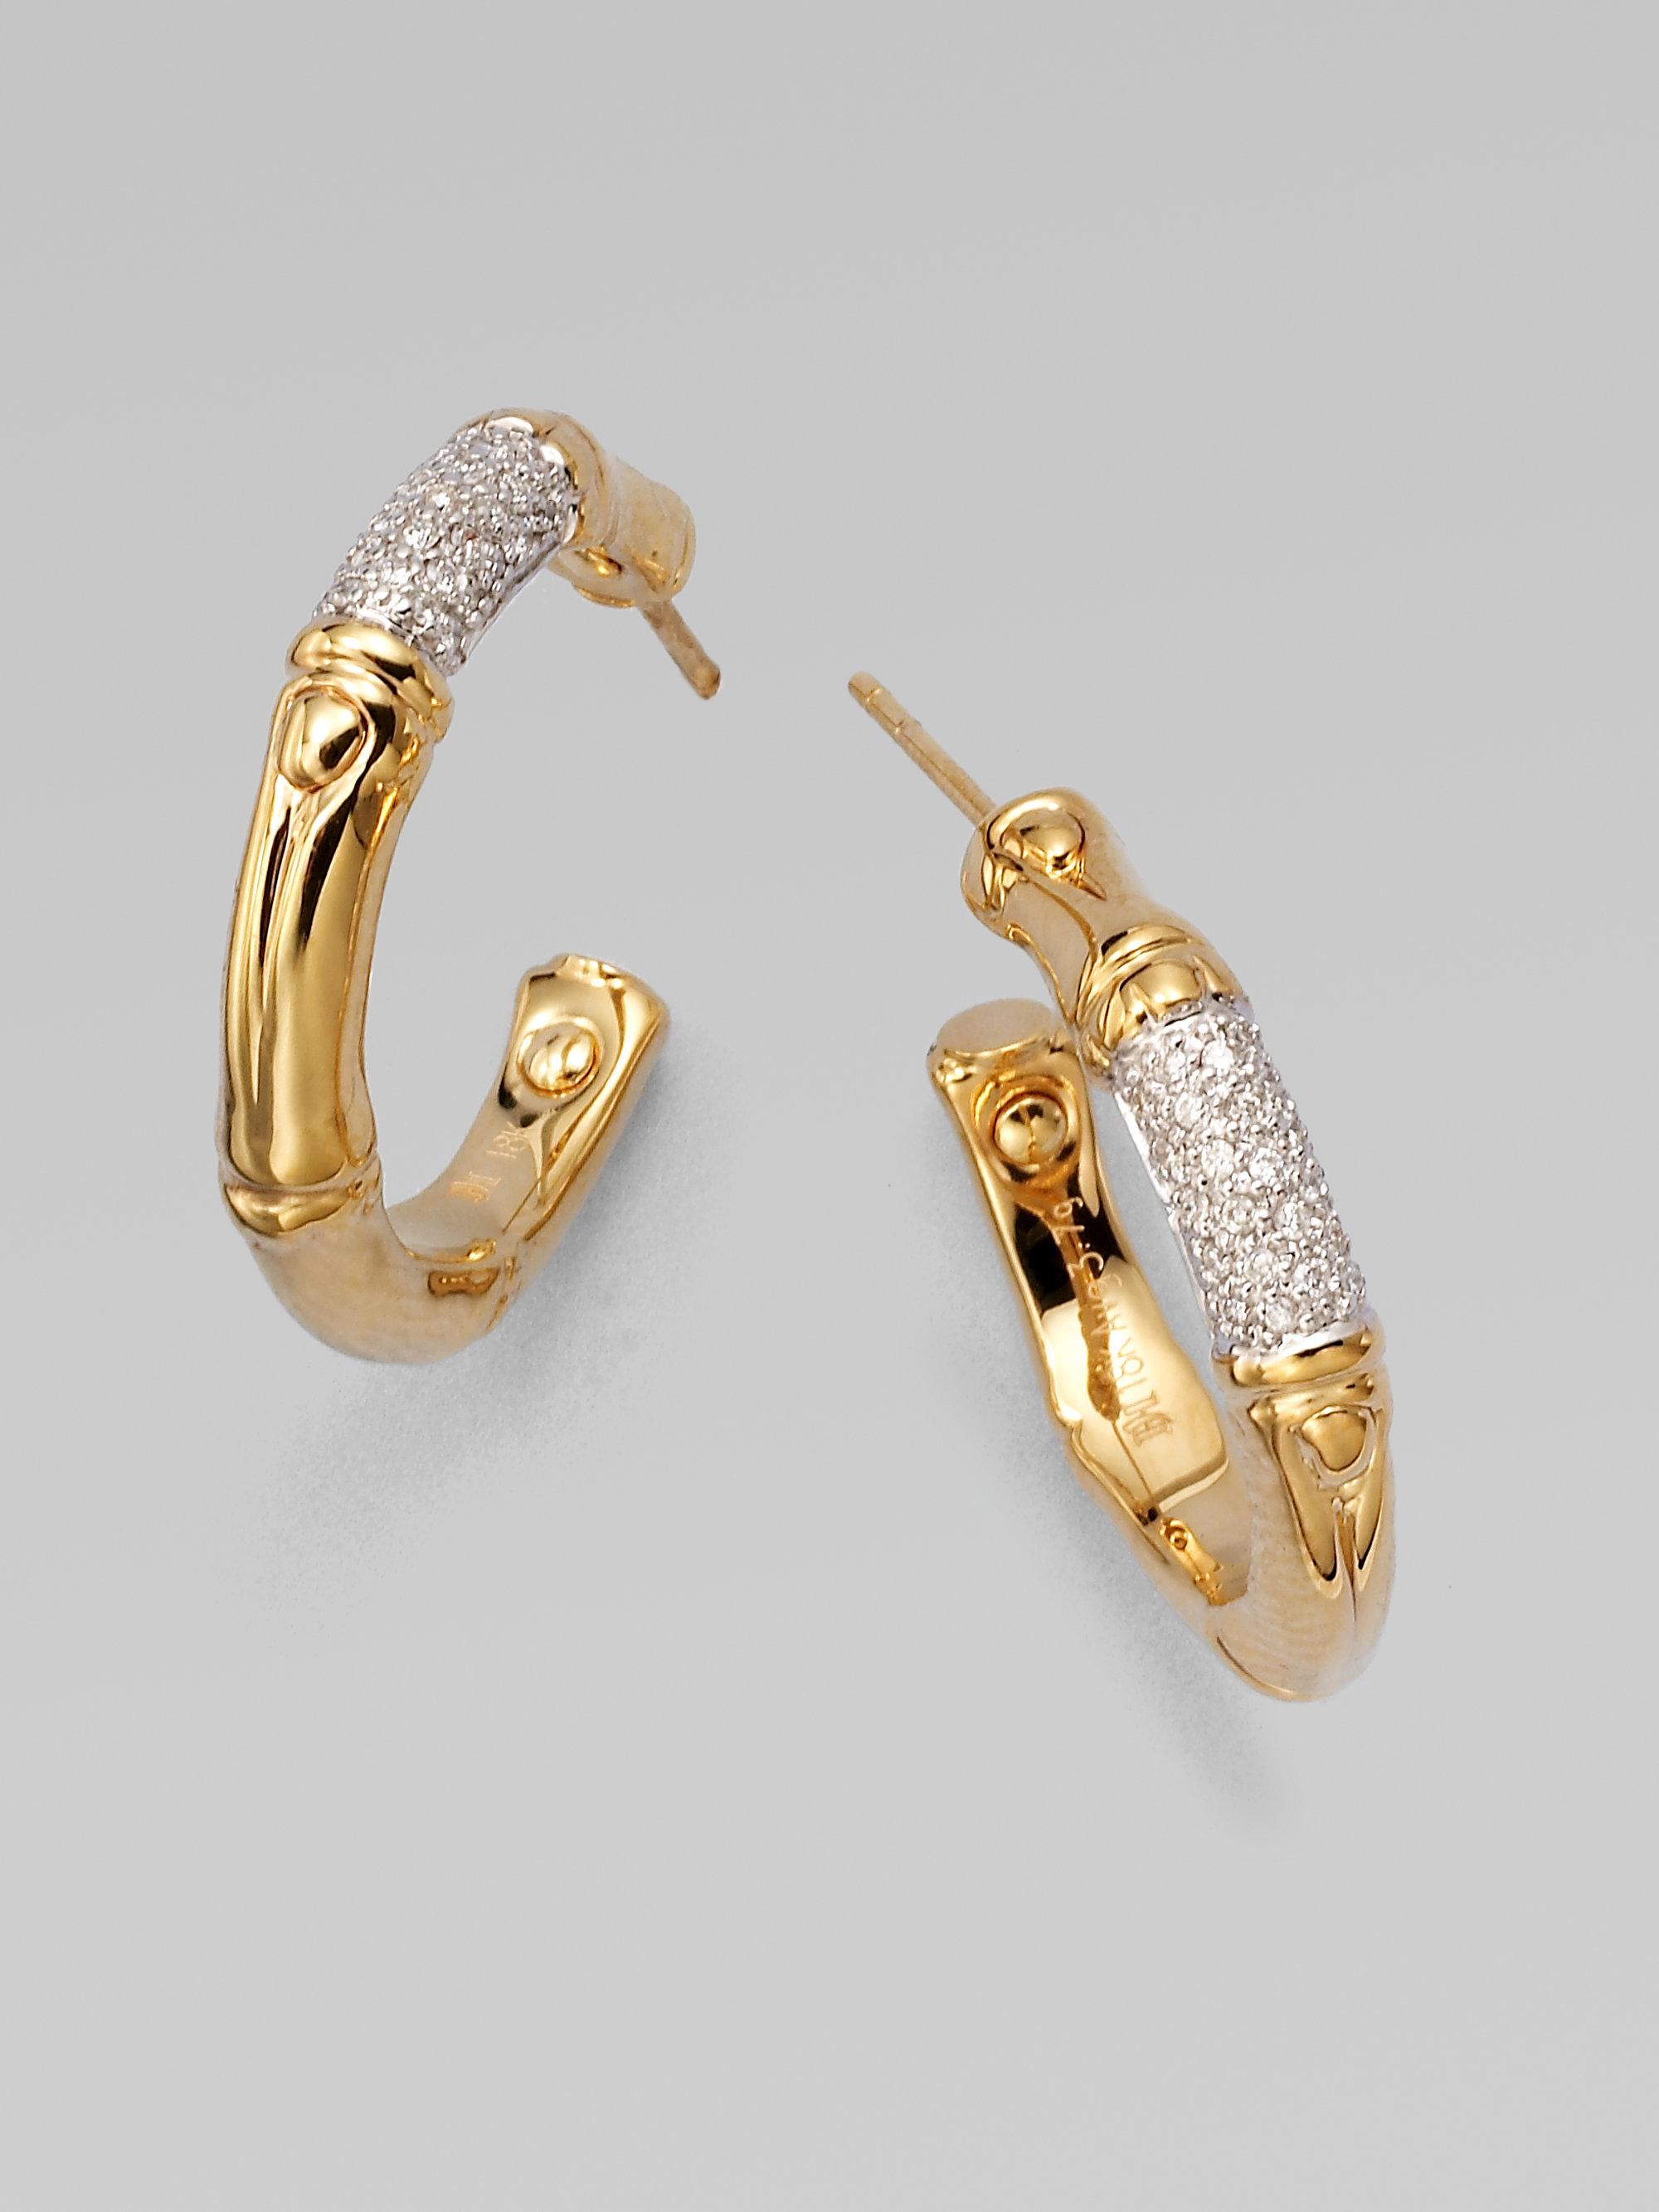 John hardy bamboo diamond 18k yellow gold hoop earrings for John hardy jewelry earrings